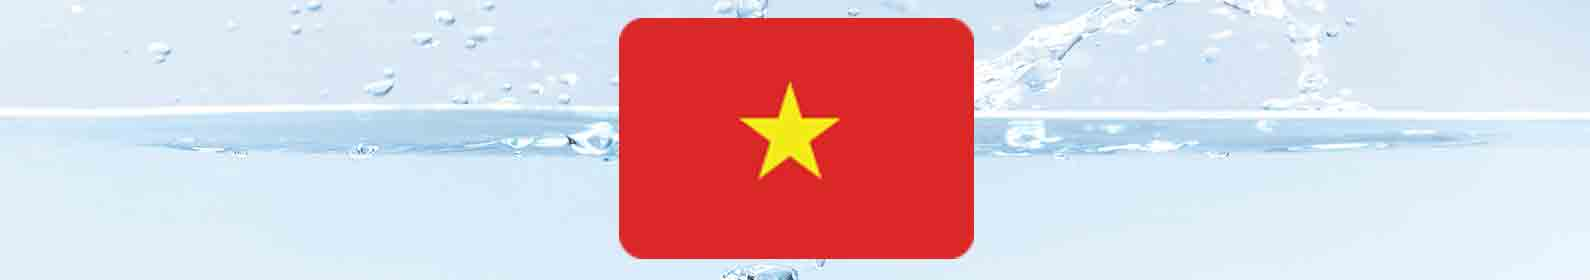 water-treatment-vietnam.jpg